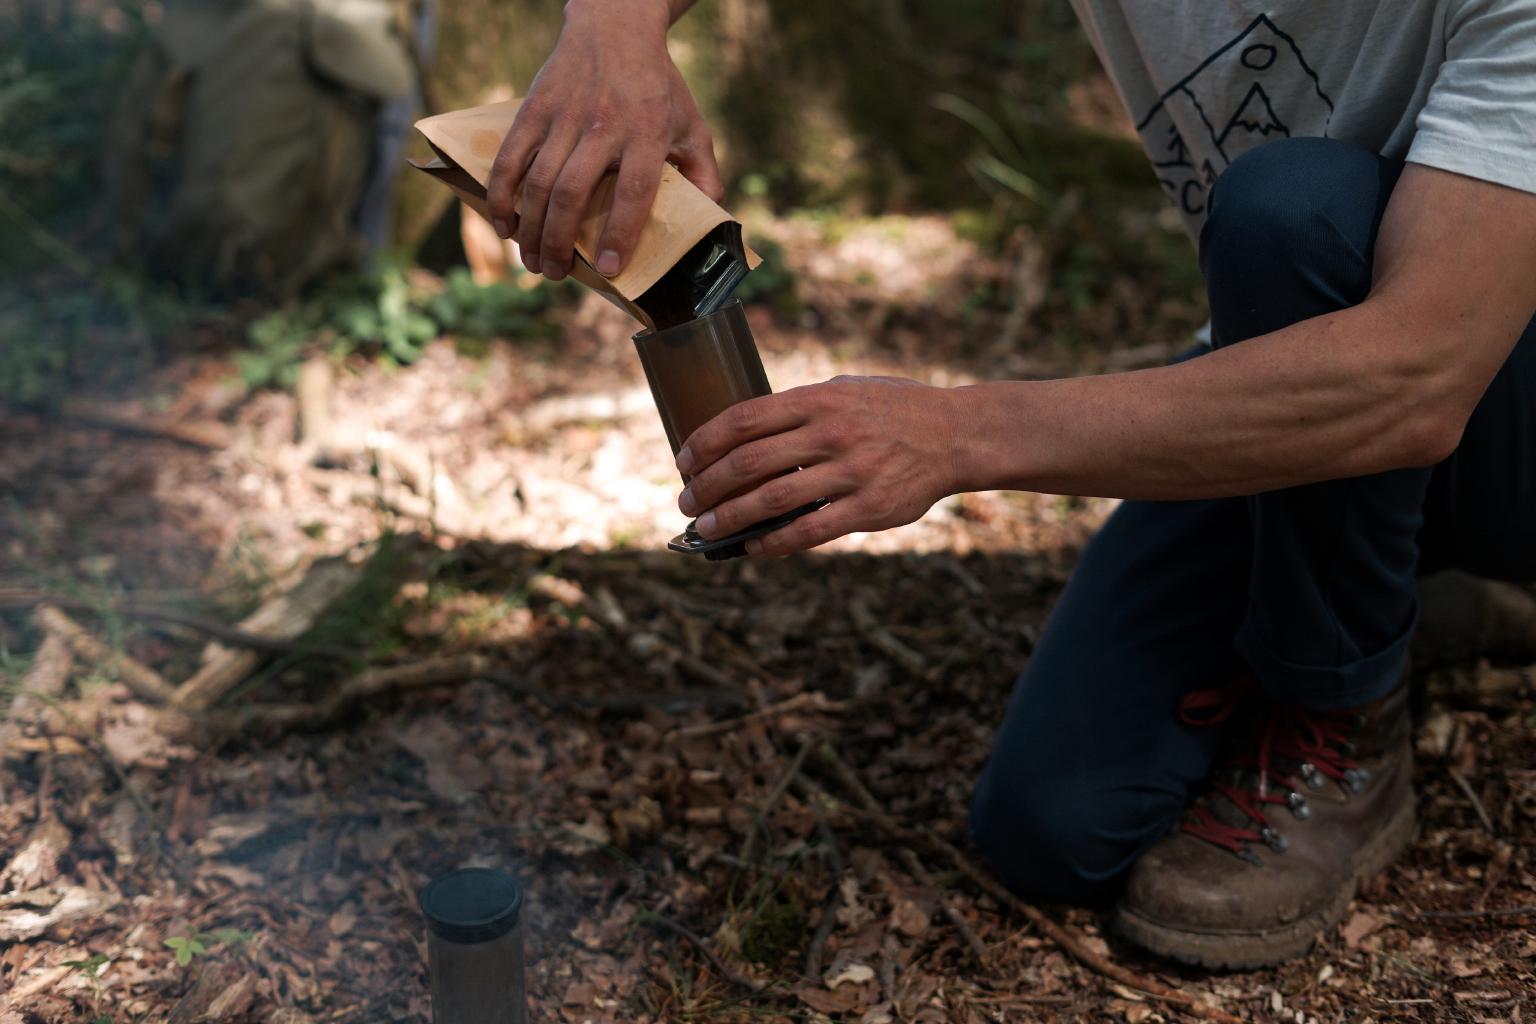 conifer_coffee_in_the_woods_3.jpg